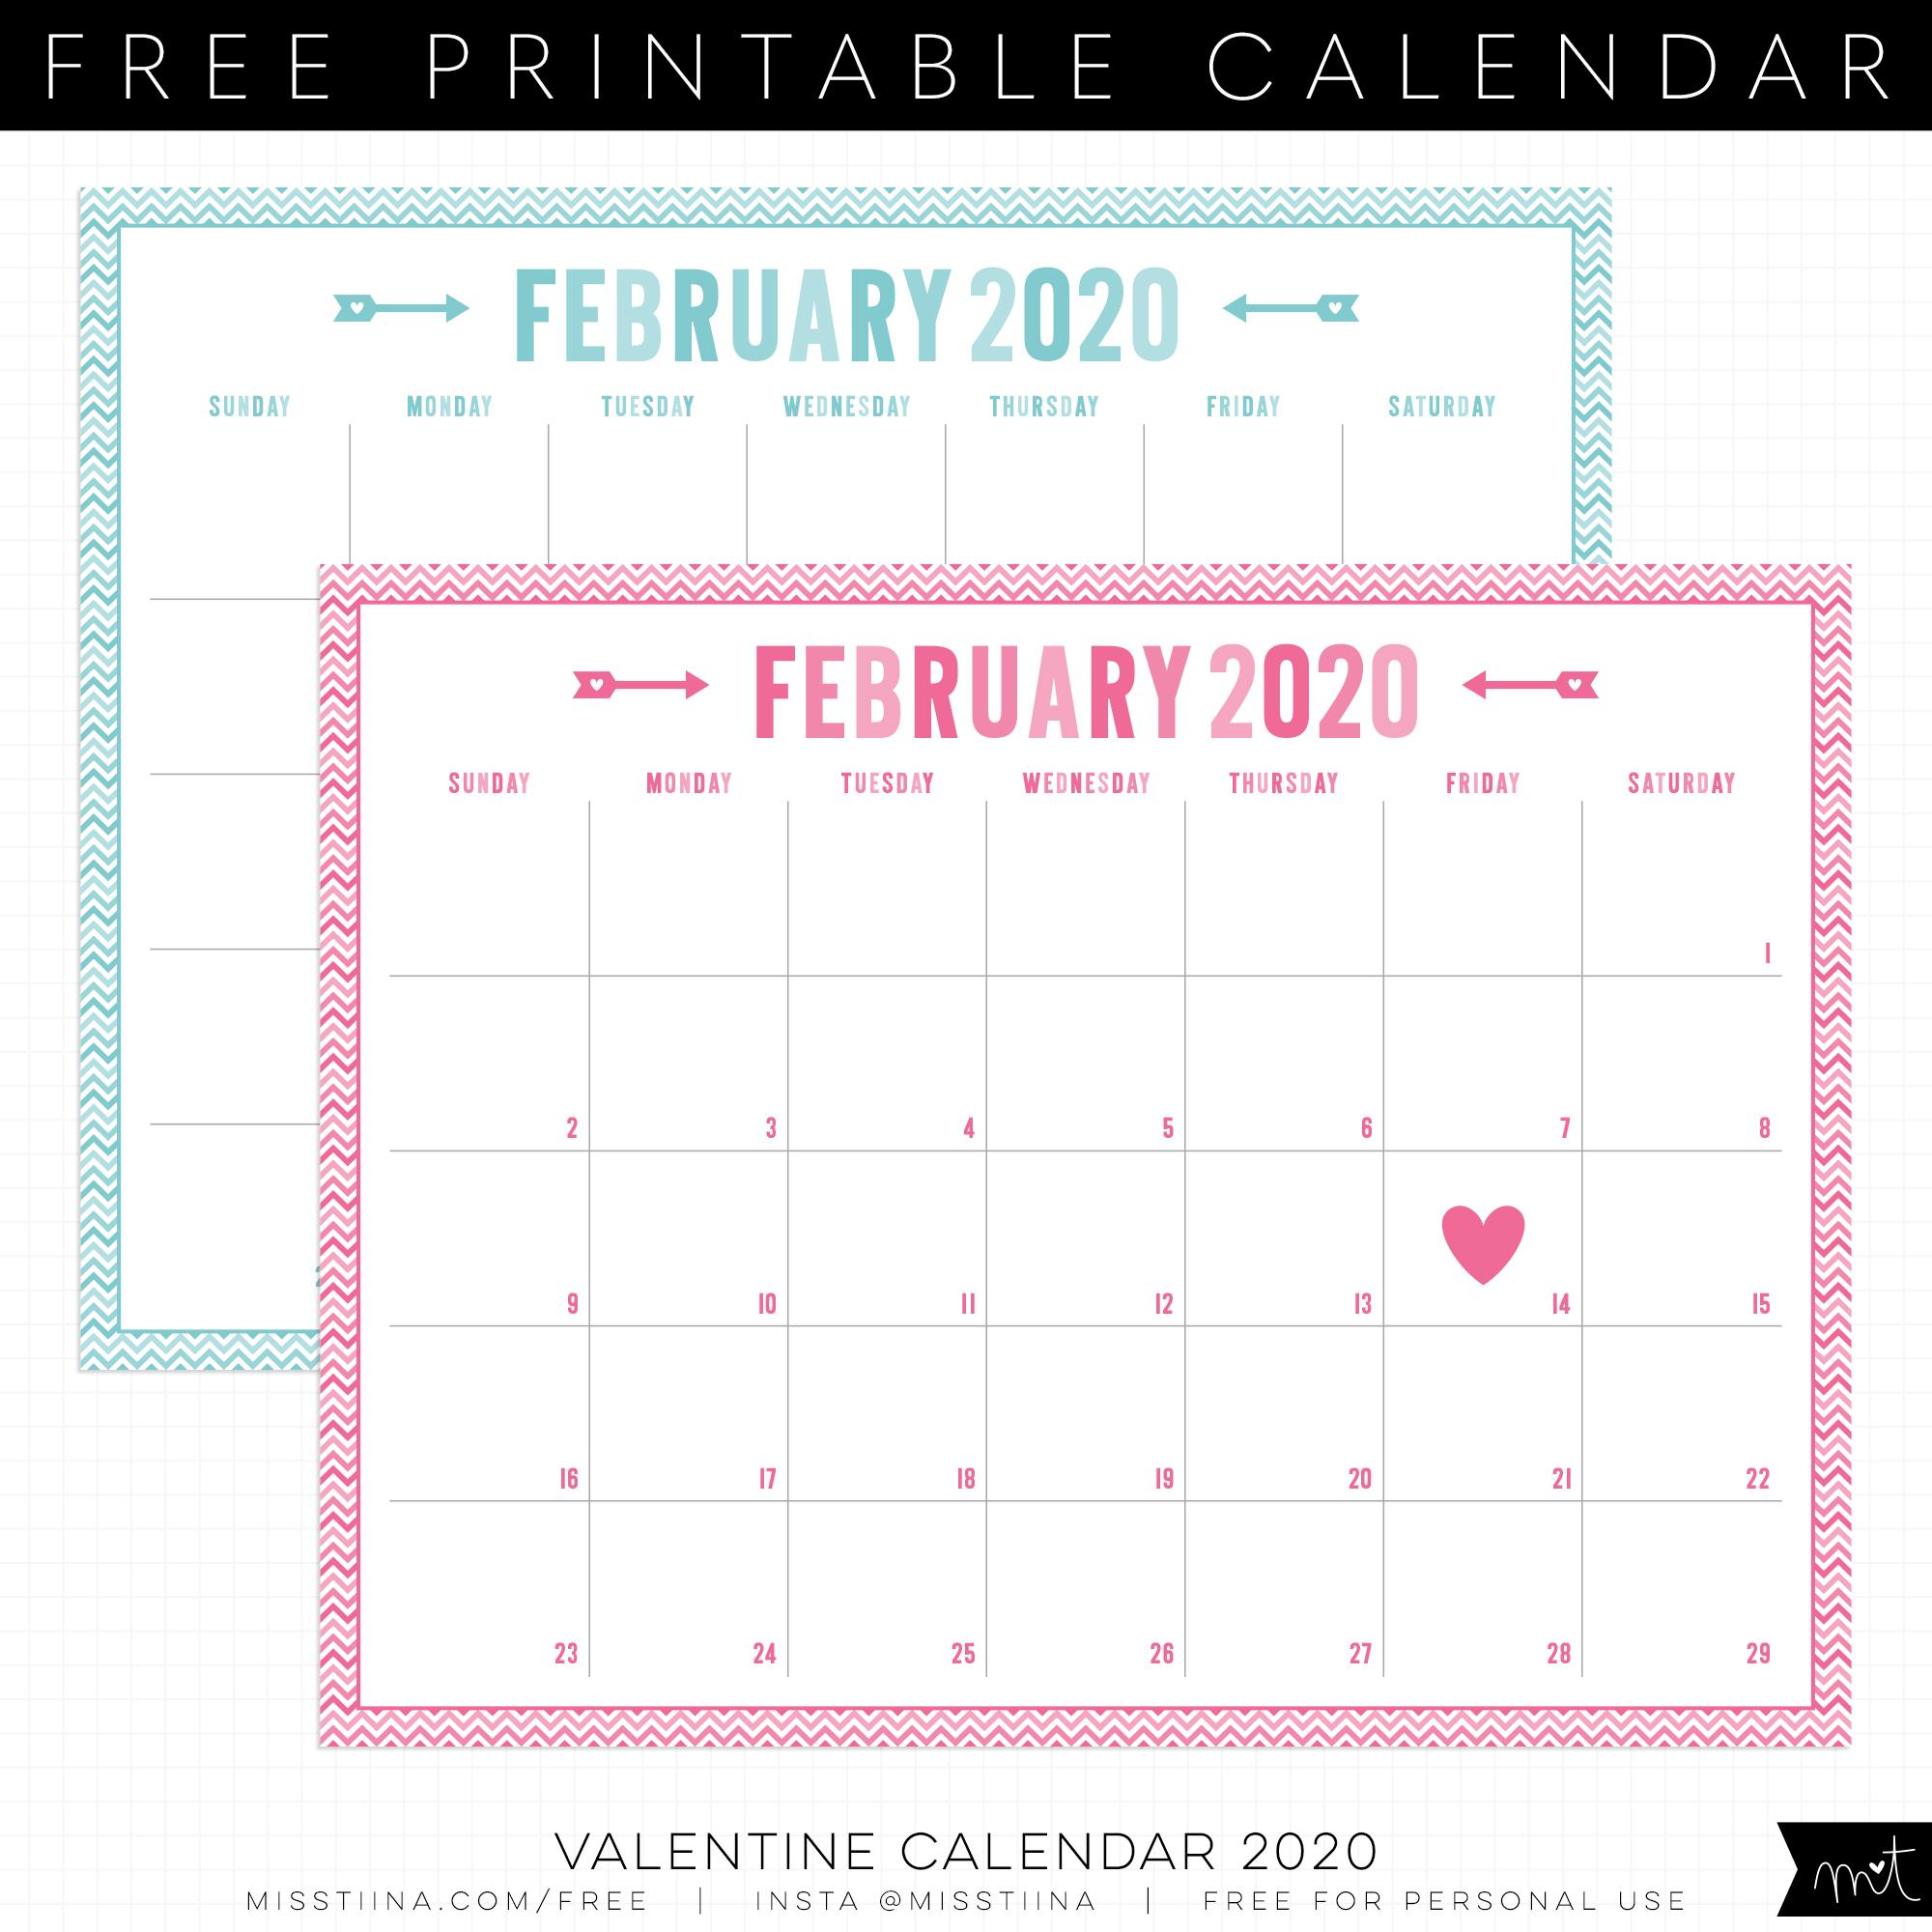 Free 2019 Valentine Calendar Printables | Misstiina